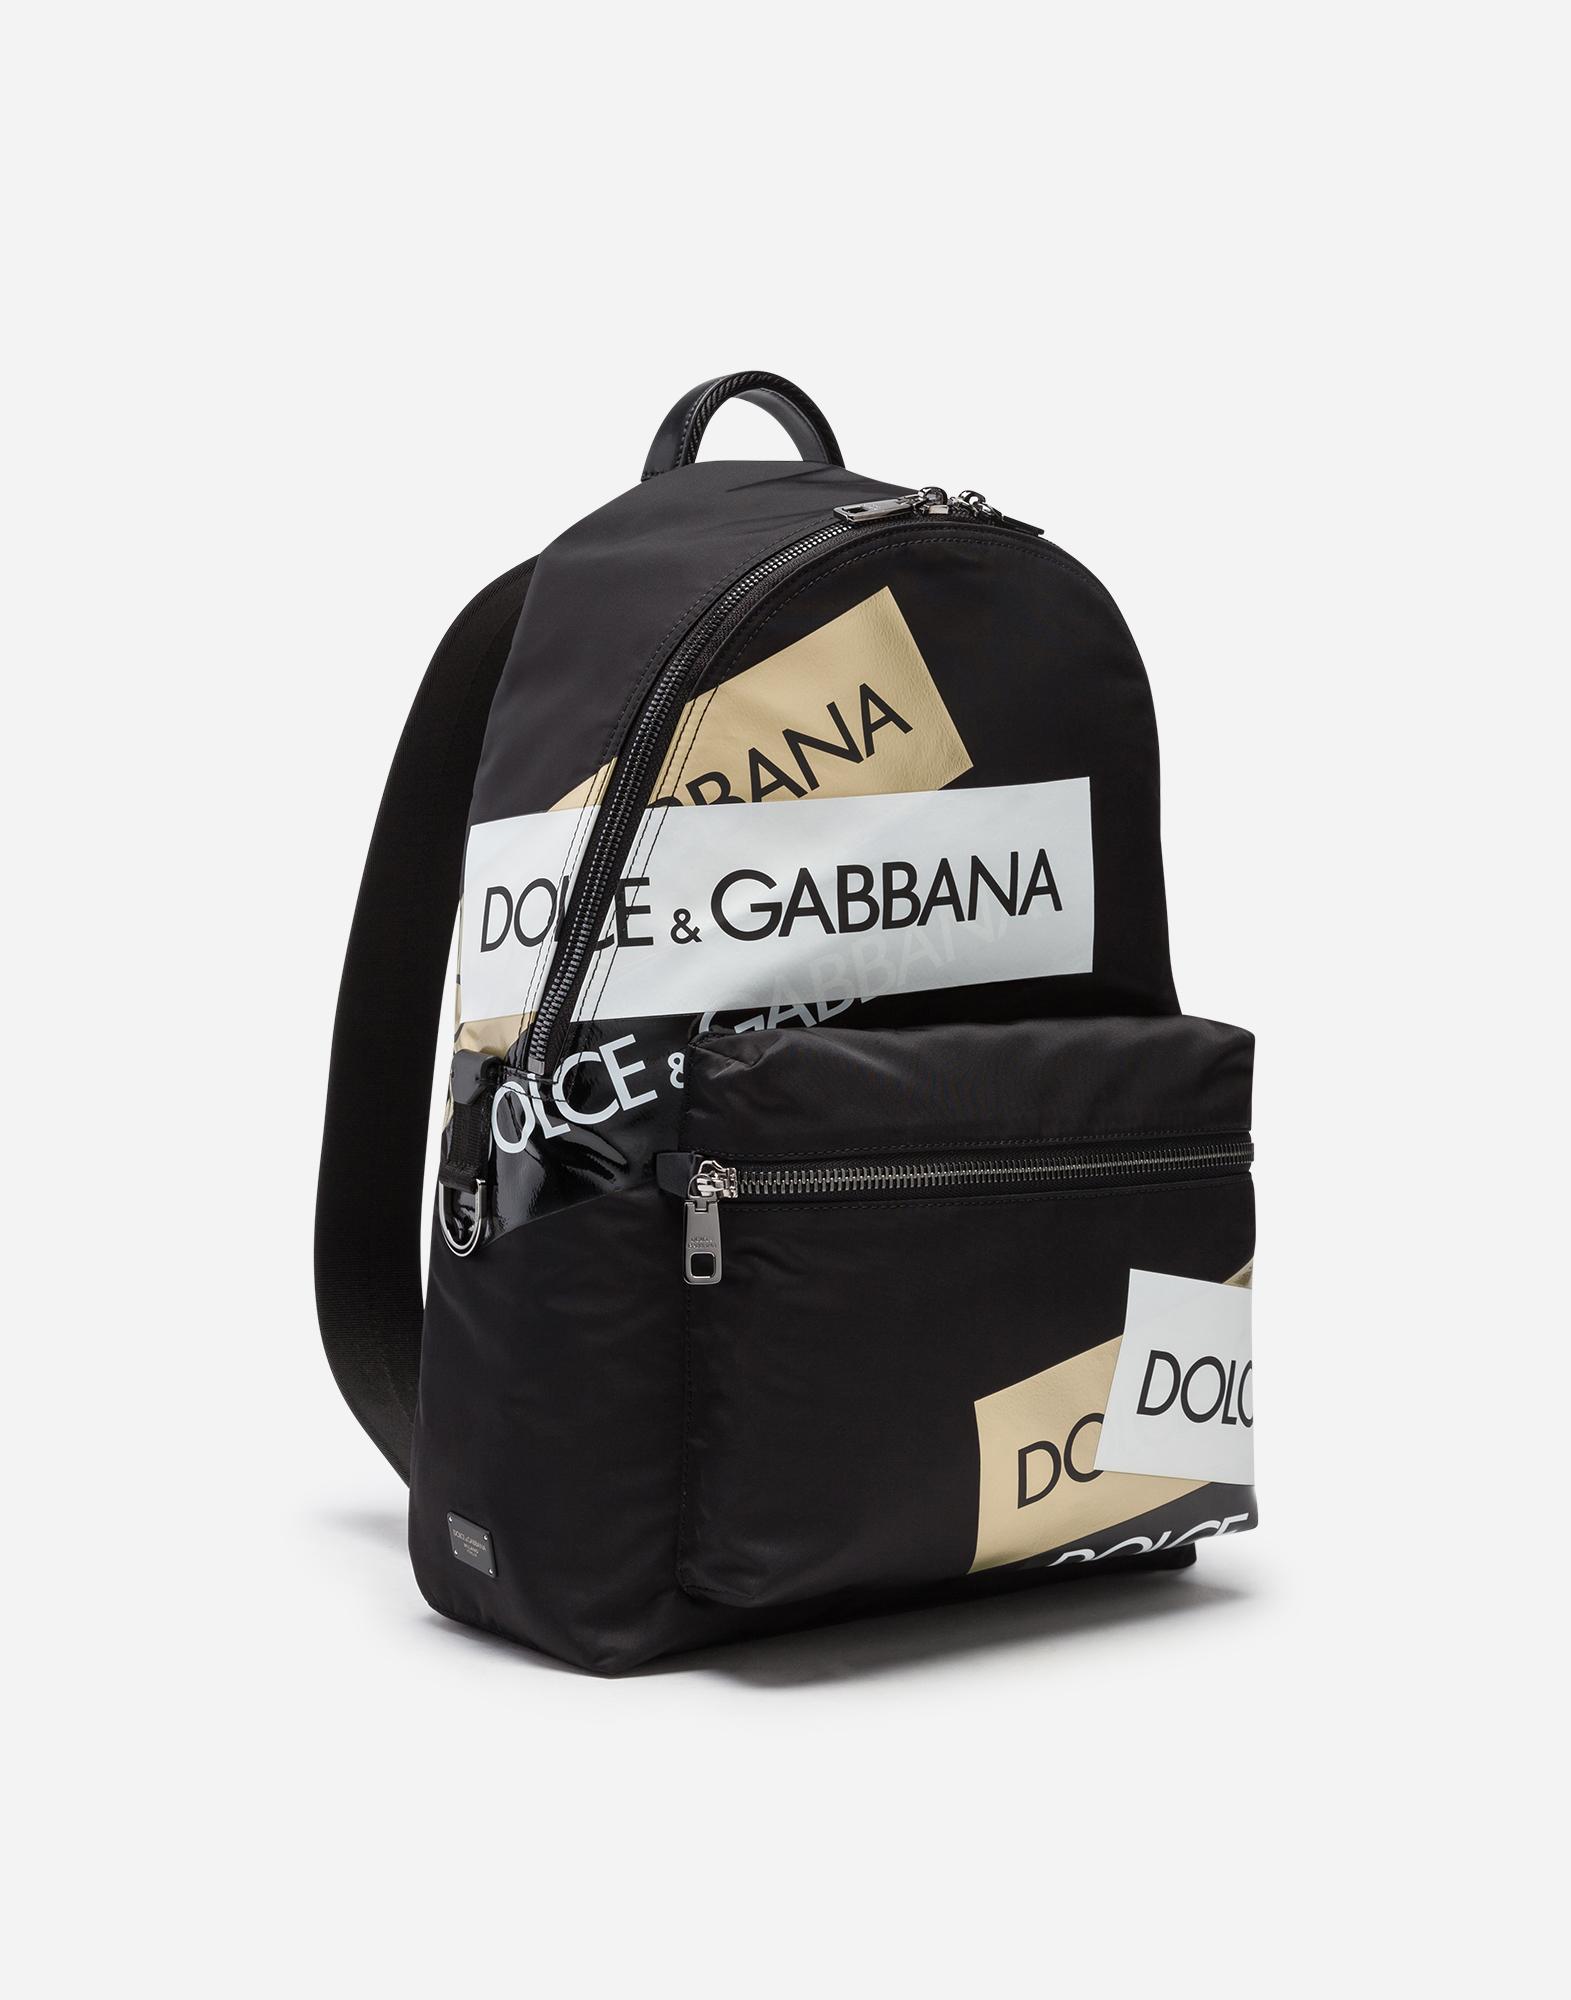 Dolce & Gabbana PRINTED NYLON VULCANO BACKPACK